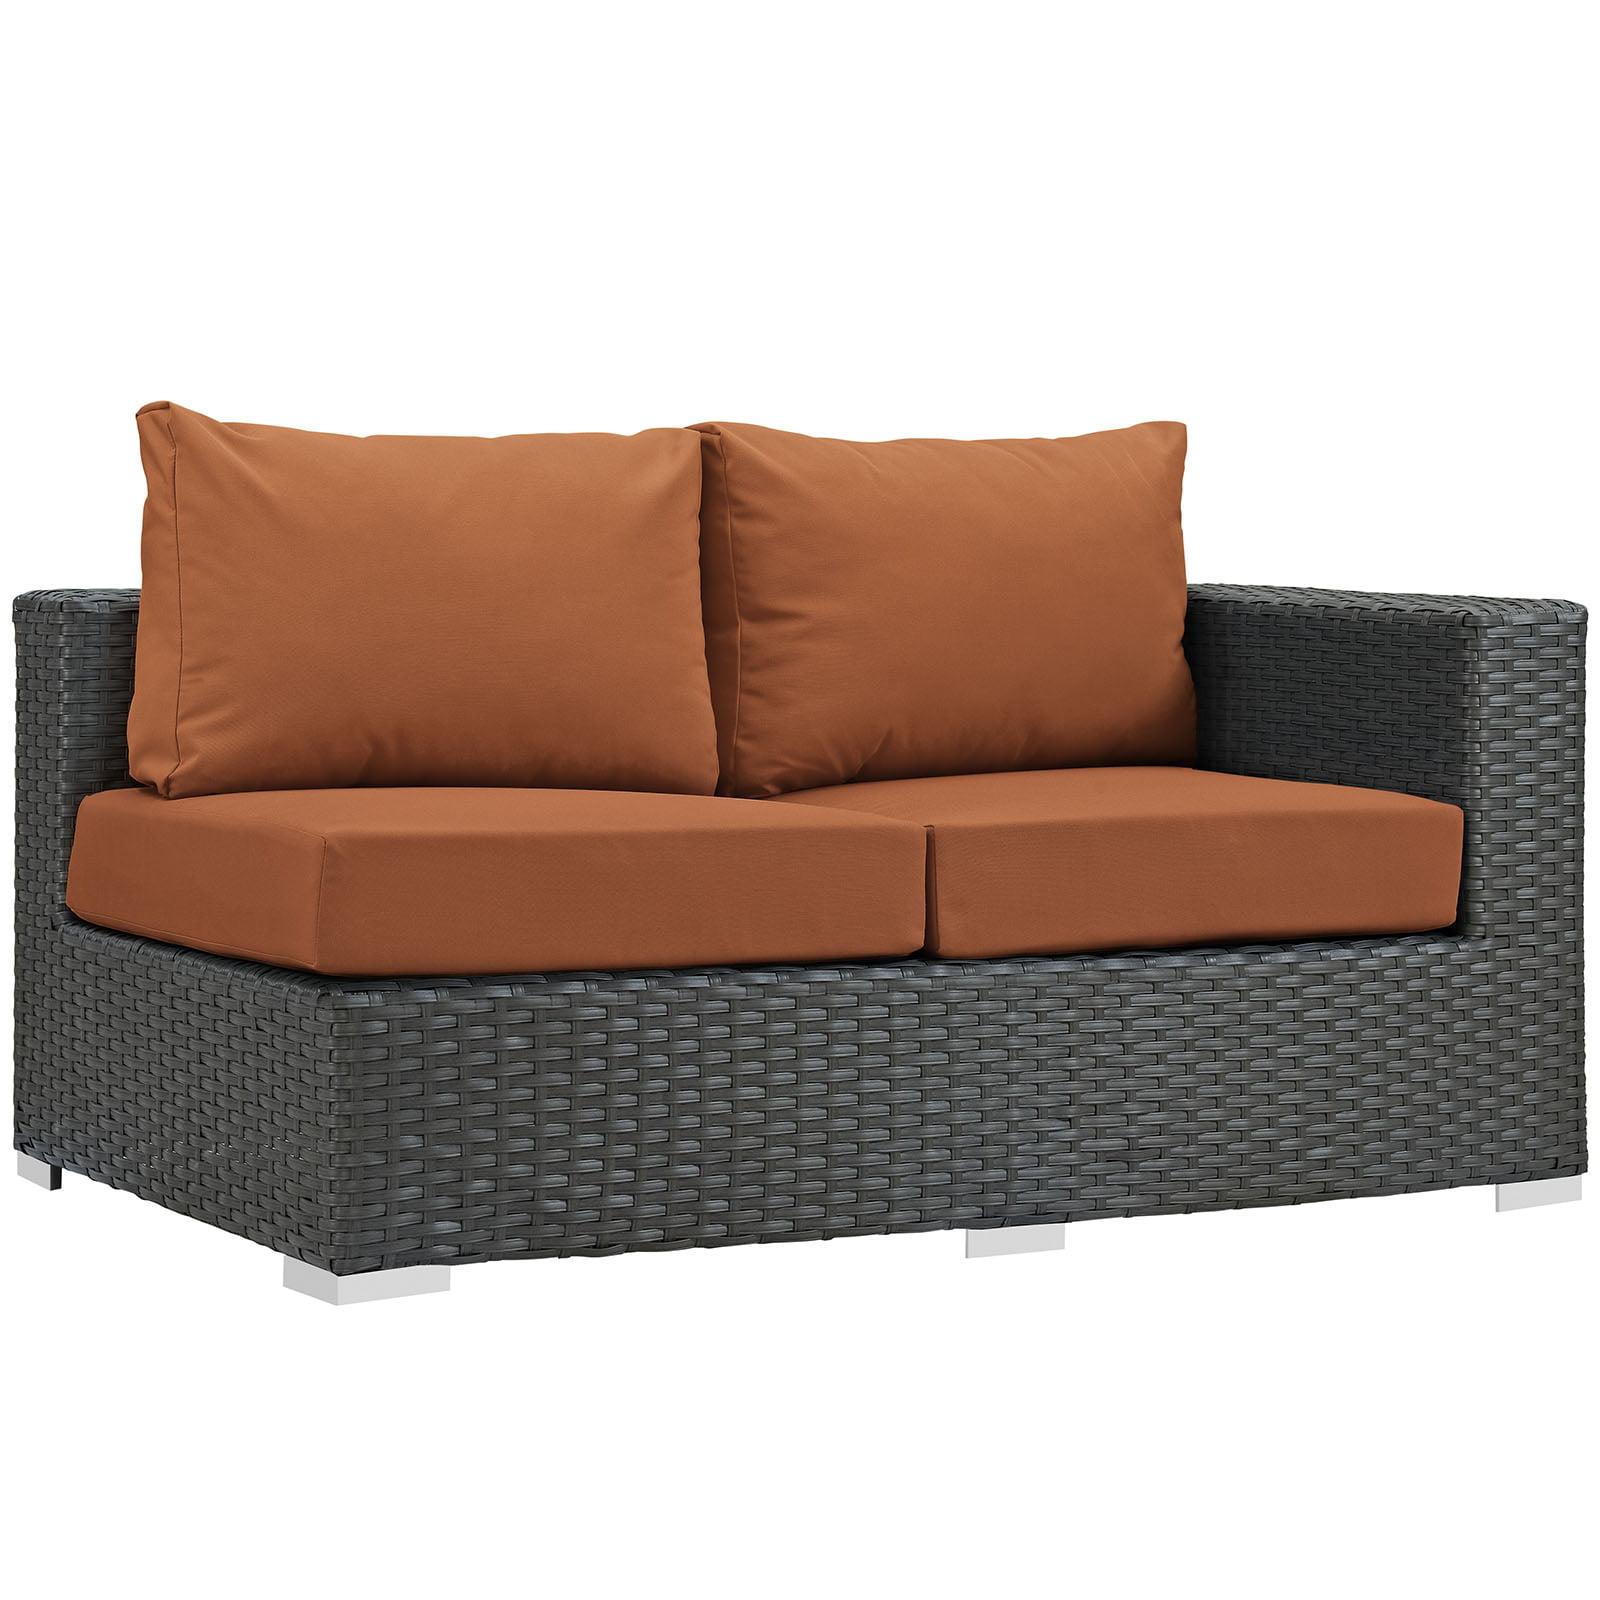 Modern Contemporary Urban Design Outdoor Patio Balcony Right Arm Loveseat Sofa, Orange, Rattan